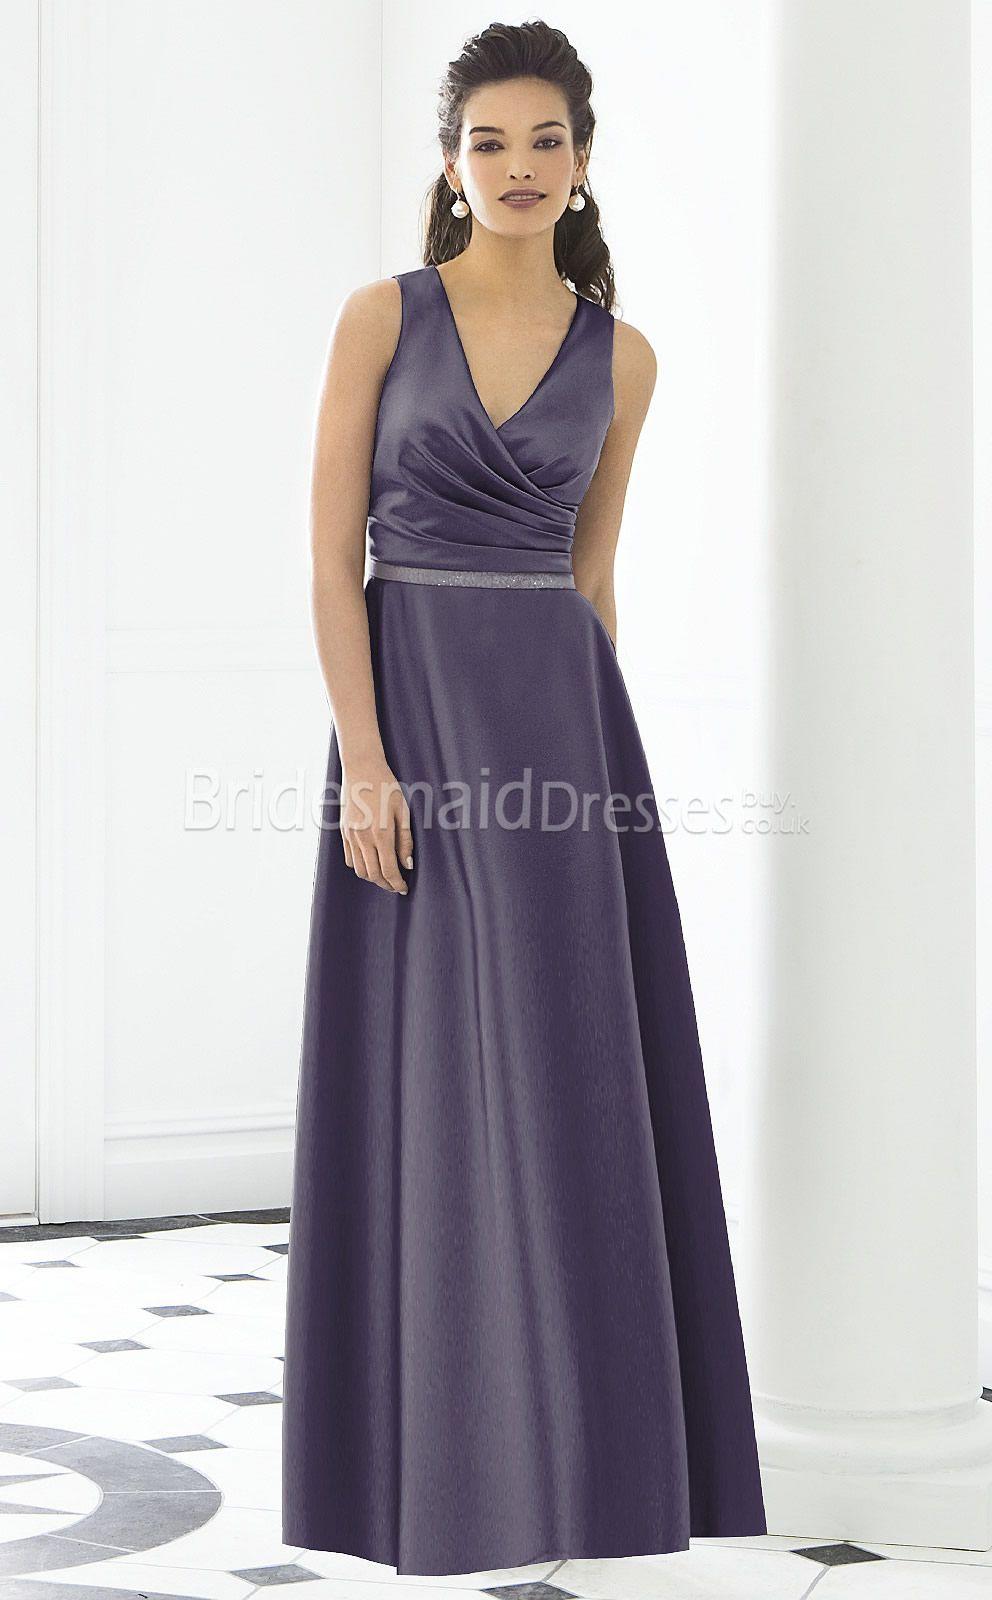 Lavender satin princess v neck floor length with criss cross lavender satin princess v neck floor length with criss cross bridesmaid dressesukbd03 ombrellifo Images